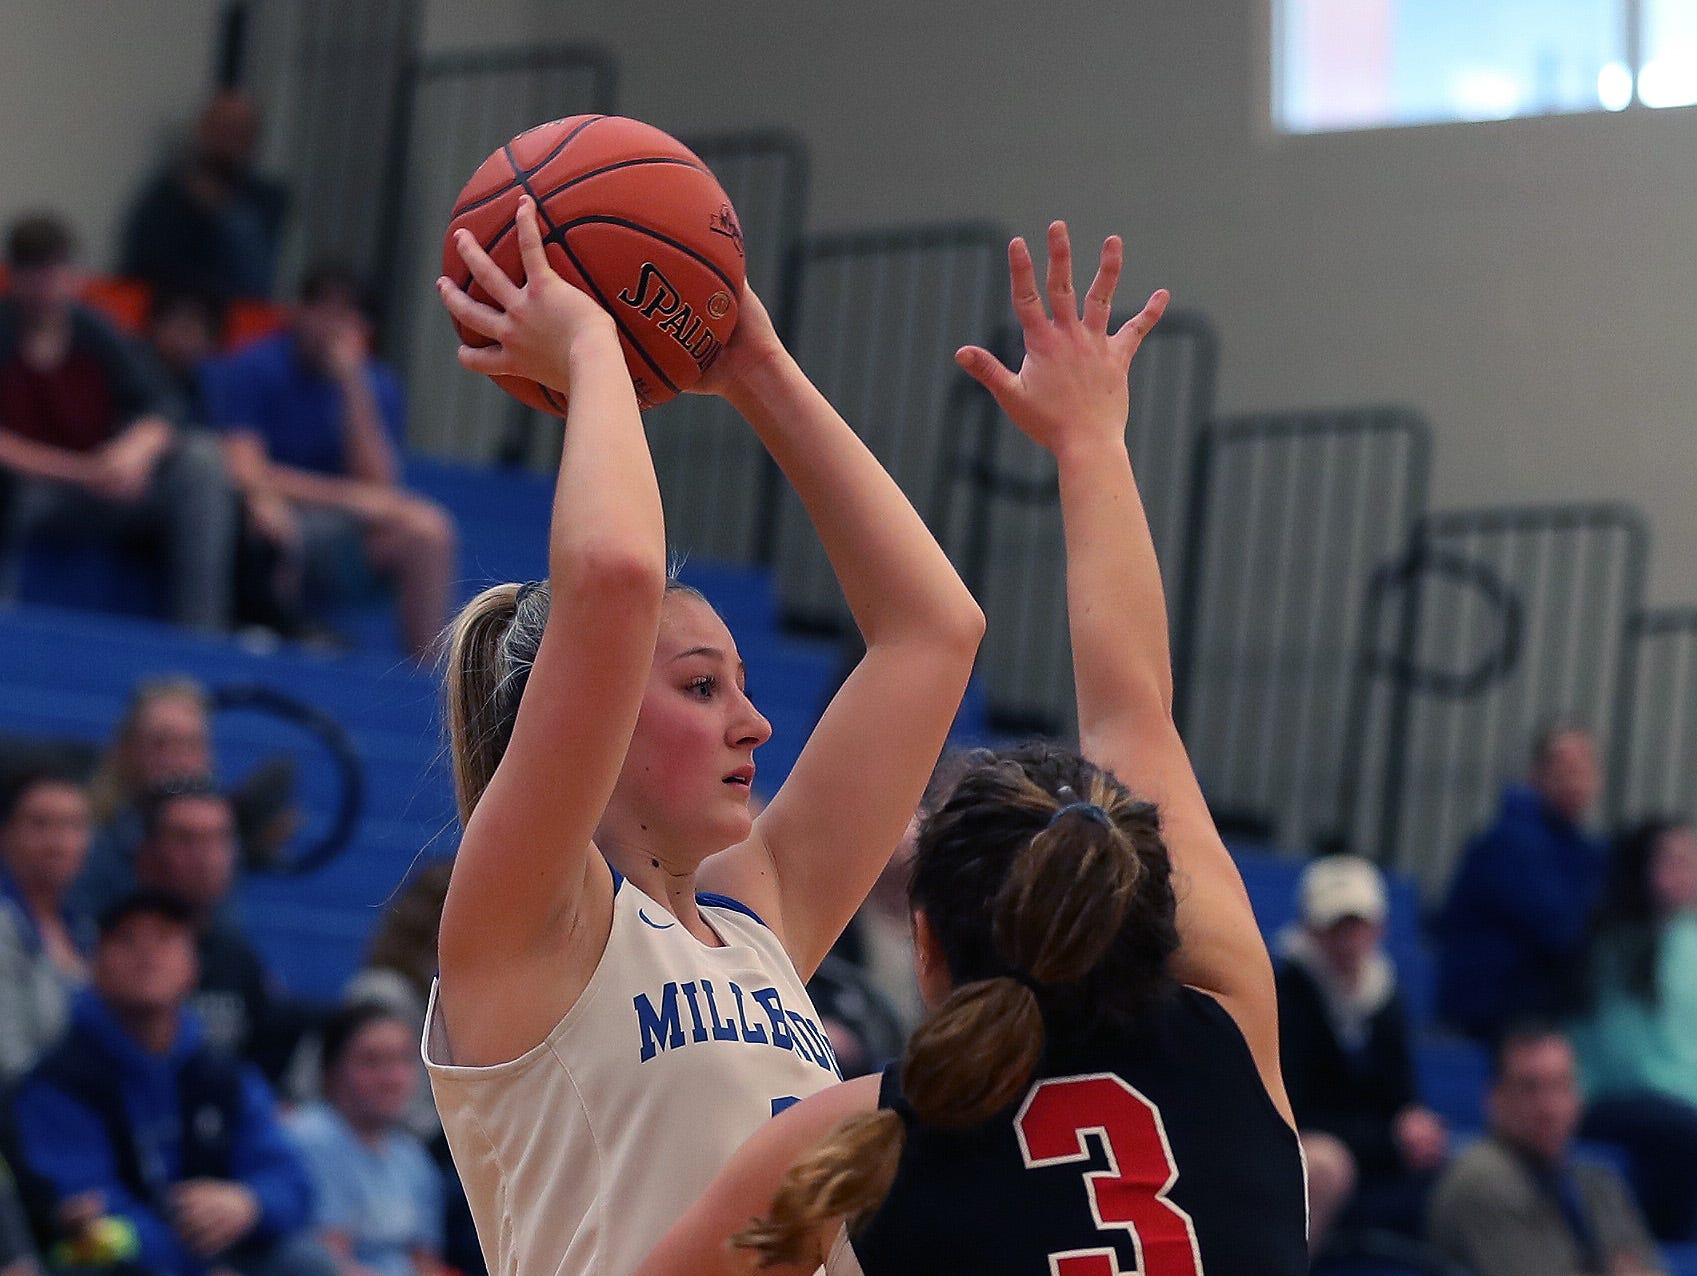 Millbrook defeated Pierson/Bridgehampton/Shelter Island 55-26 in the girls regional final at SUNY New Paltz Match 9, 2019.